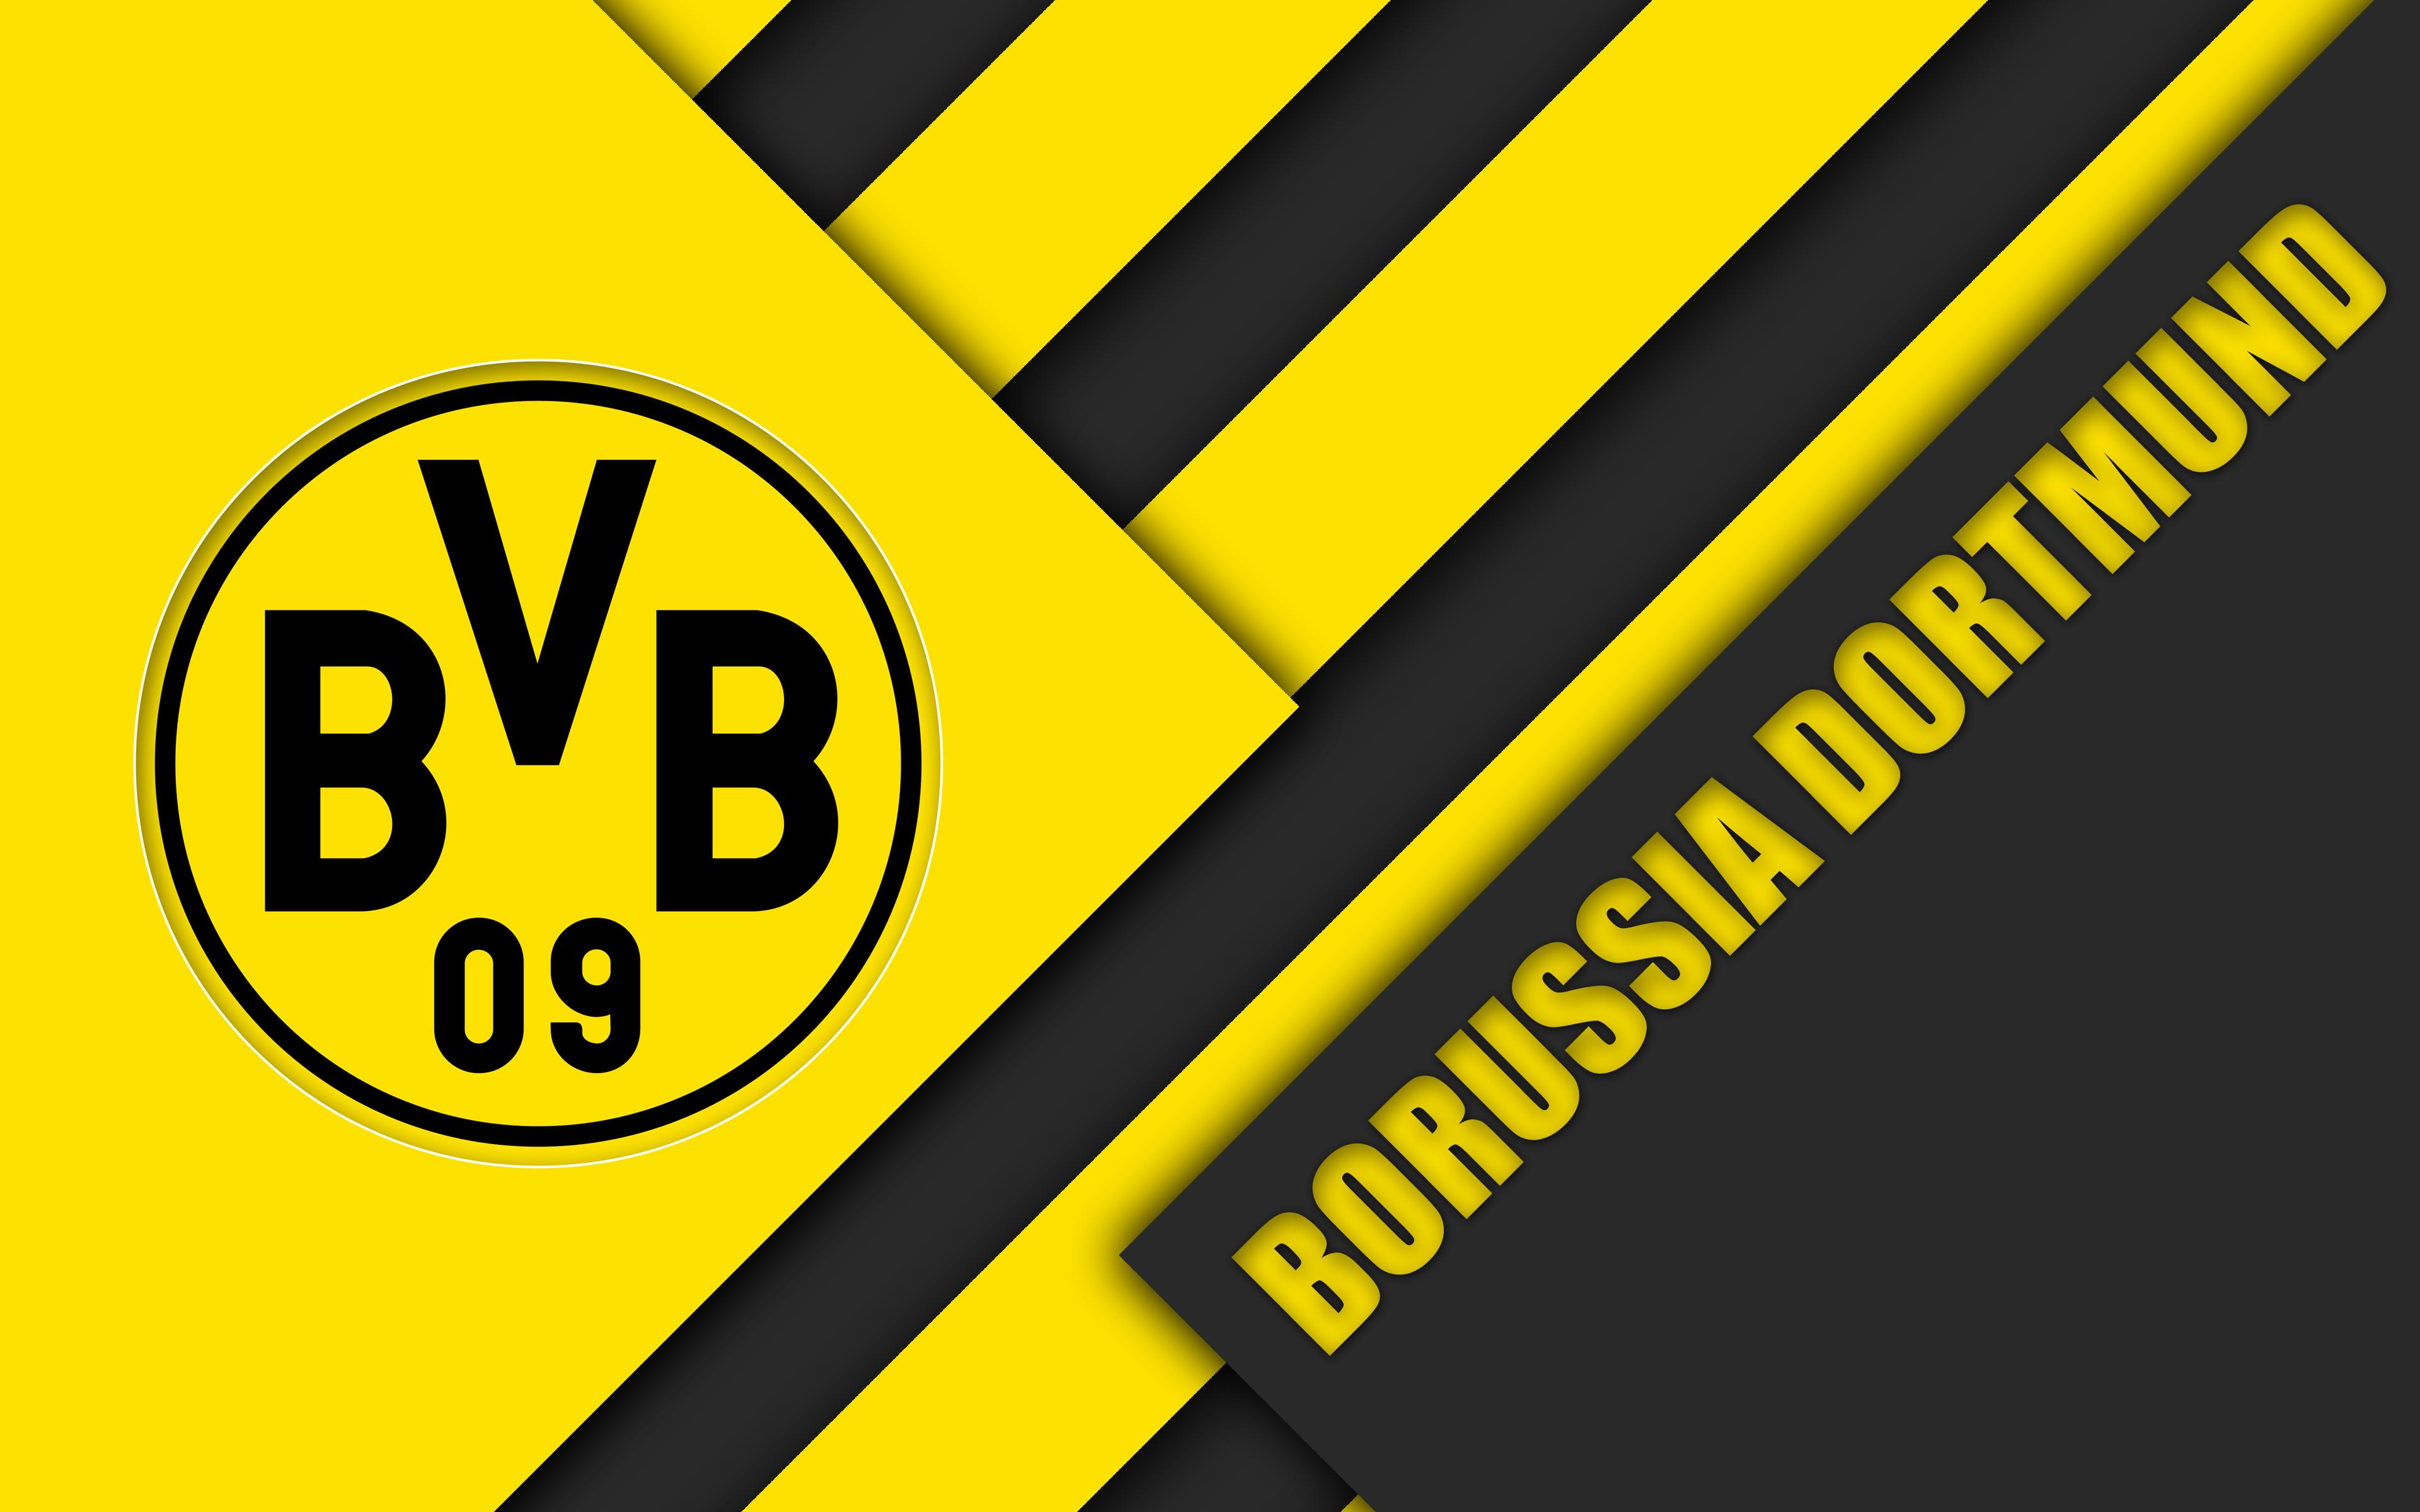 Borussia Dortmund 4k Ultra HD Wallpaper Background Image 3840x2400